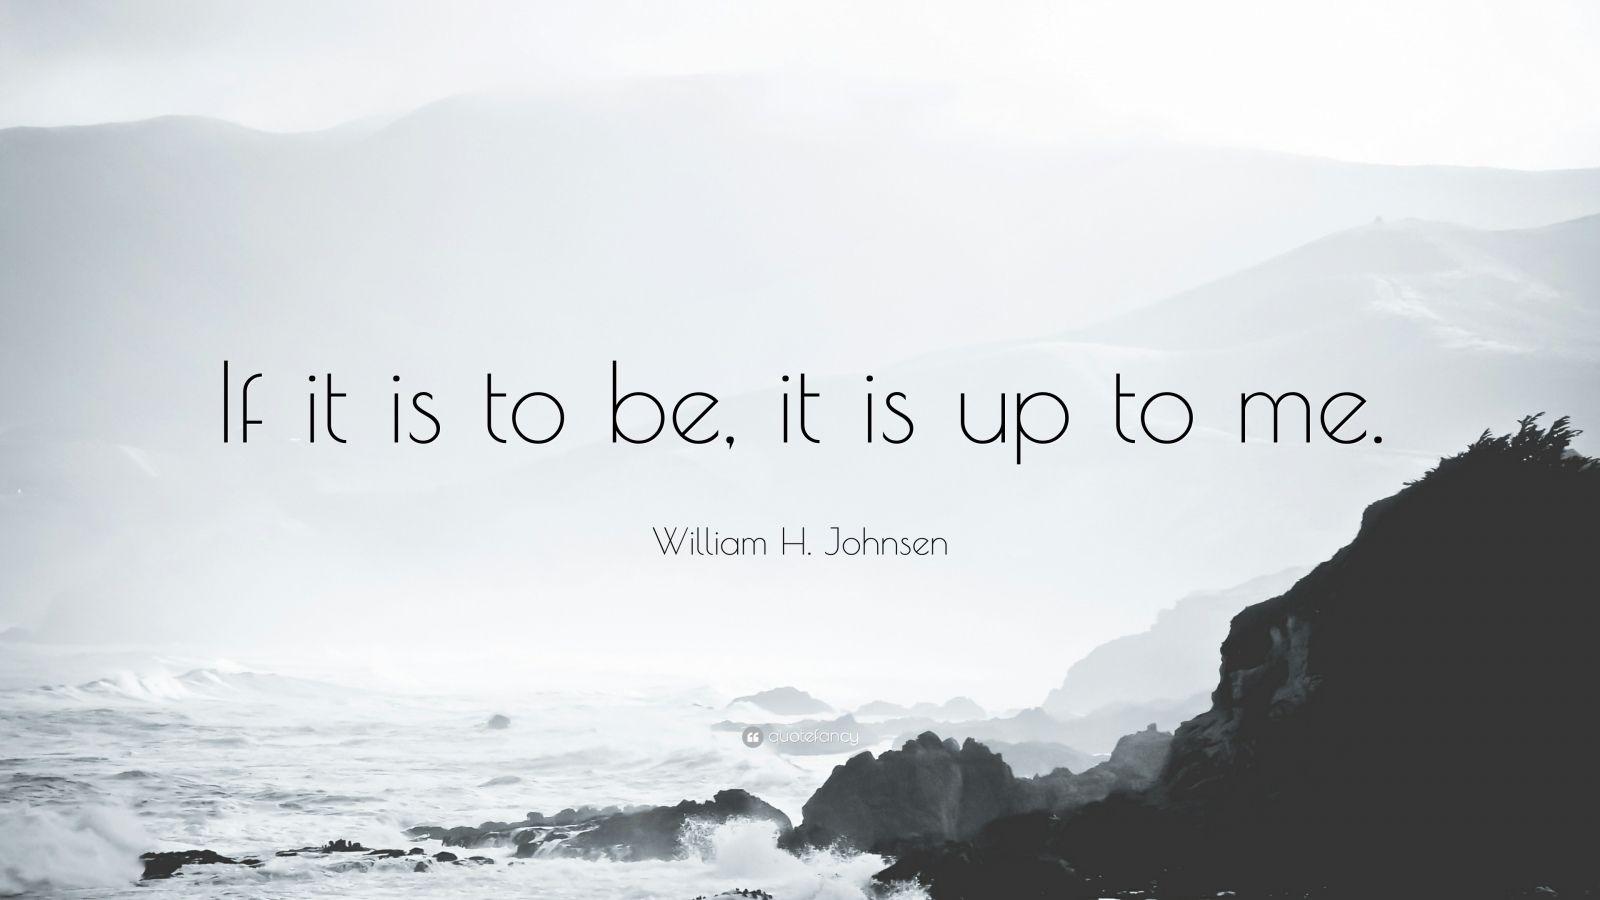 Steve Jobs Motivational Quotes Wallpaper William H Johnsen Quote If It Is To Be It Is Up To Me